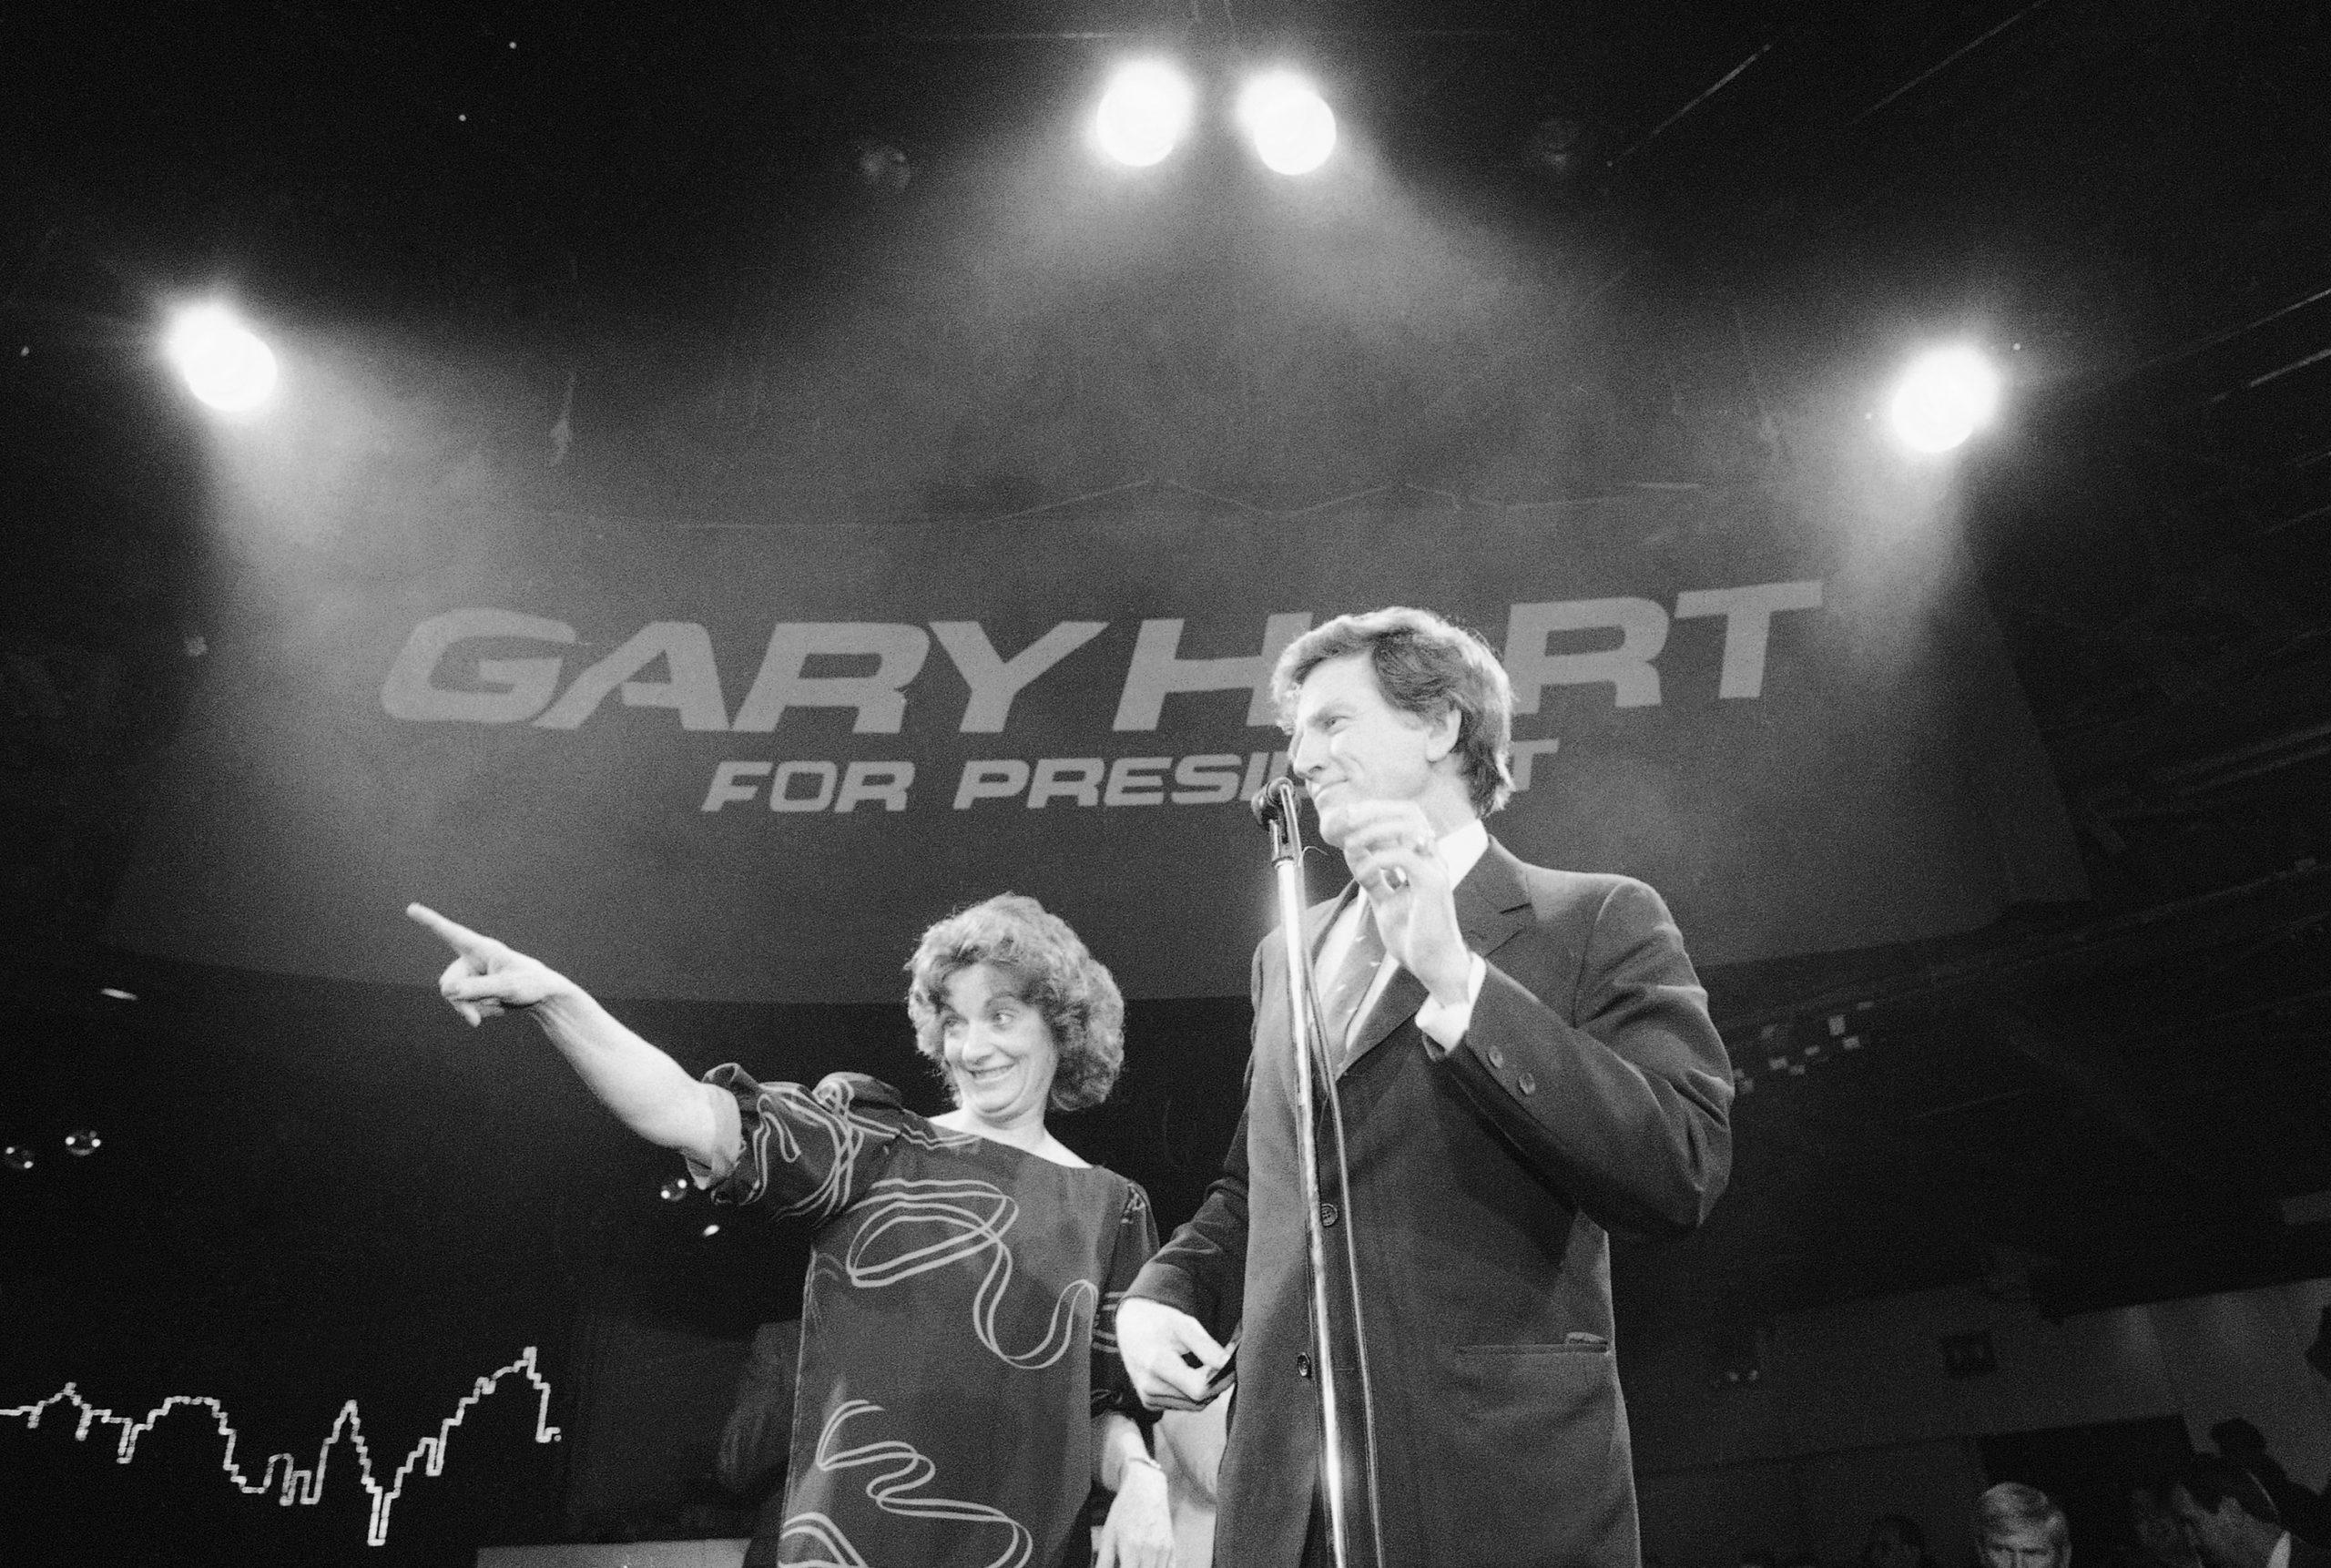 Gary Hart, Lee Hart